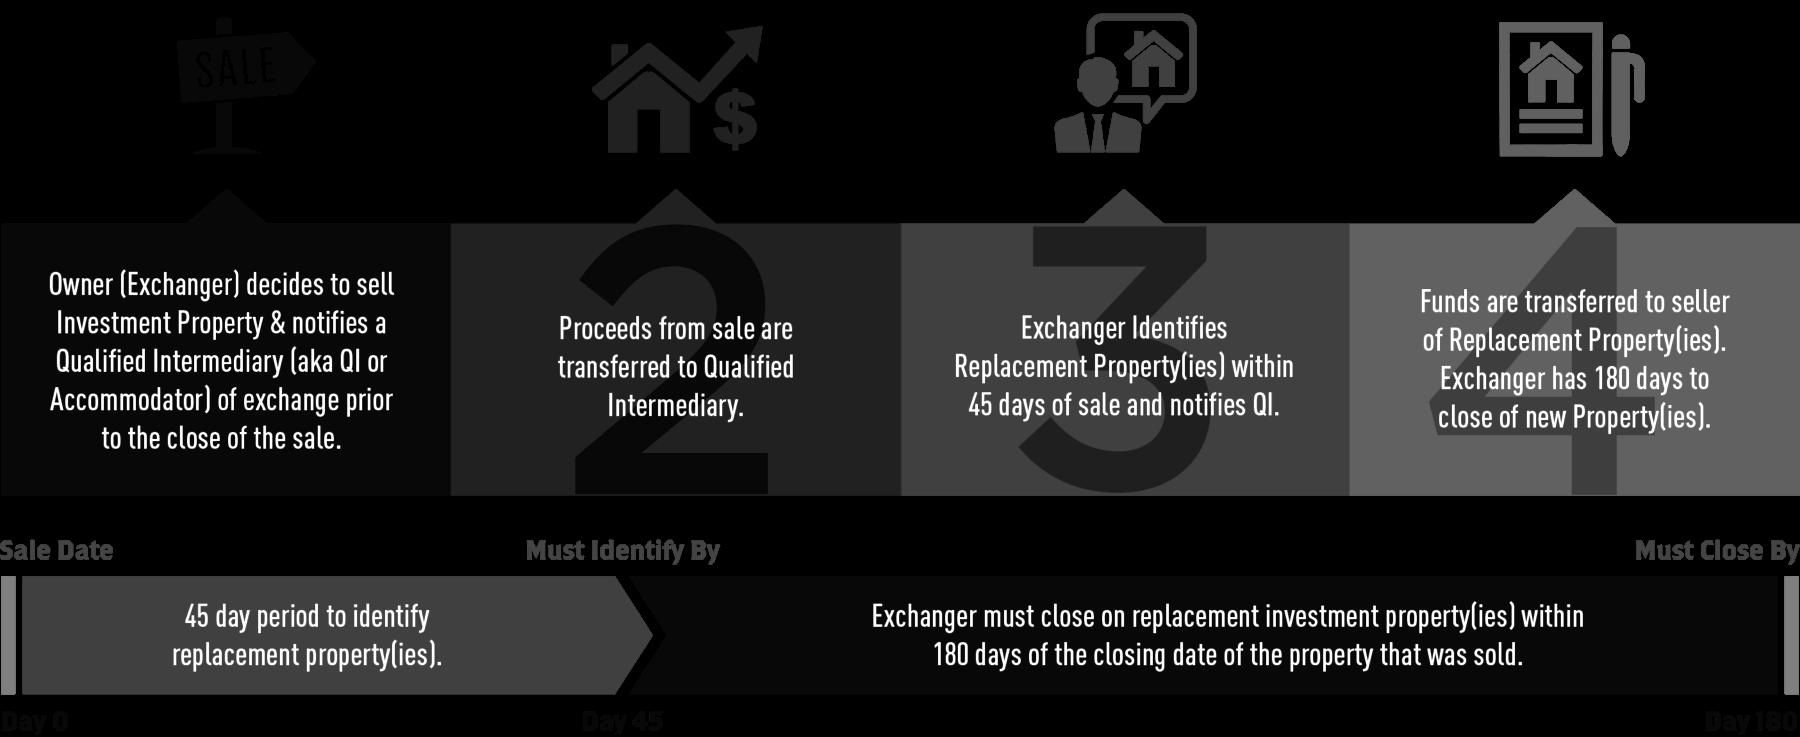 1031 Exchange Rules - câmbio diferido de imposto